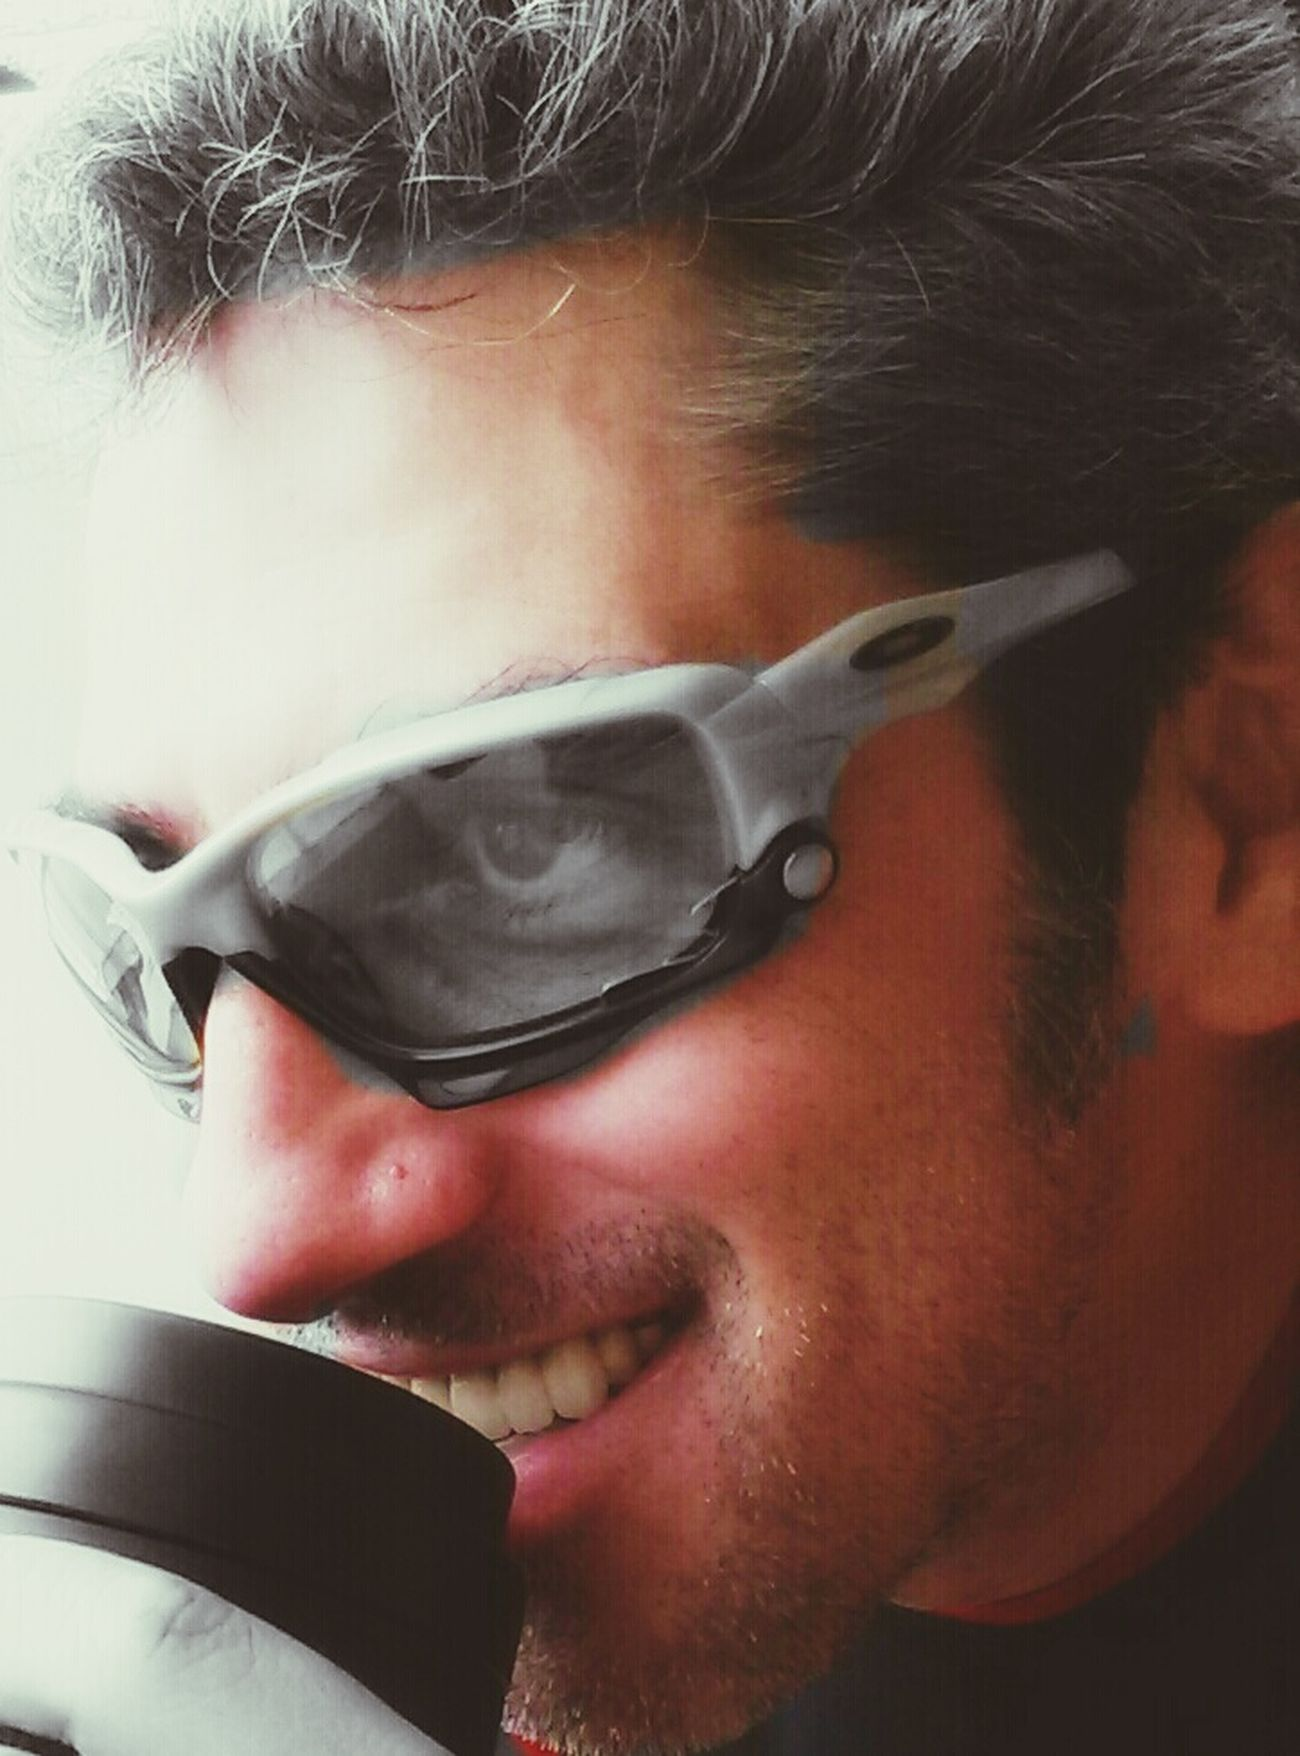 Oakleysunglasses Face FaceTime Enjoying Life That's Me Hello World Selfshot Coffee Eyes